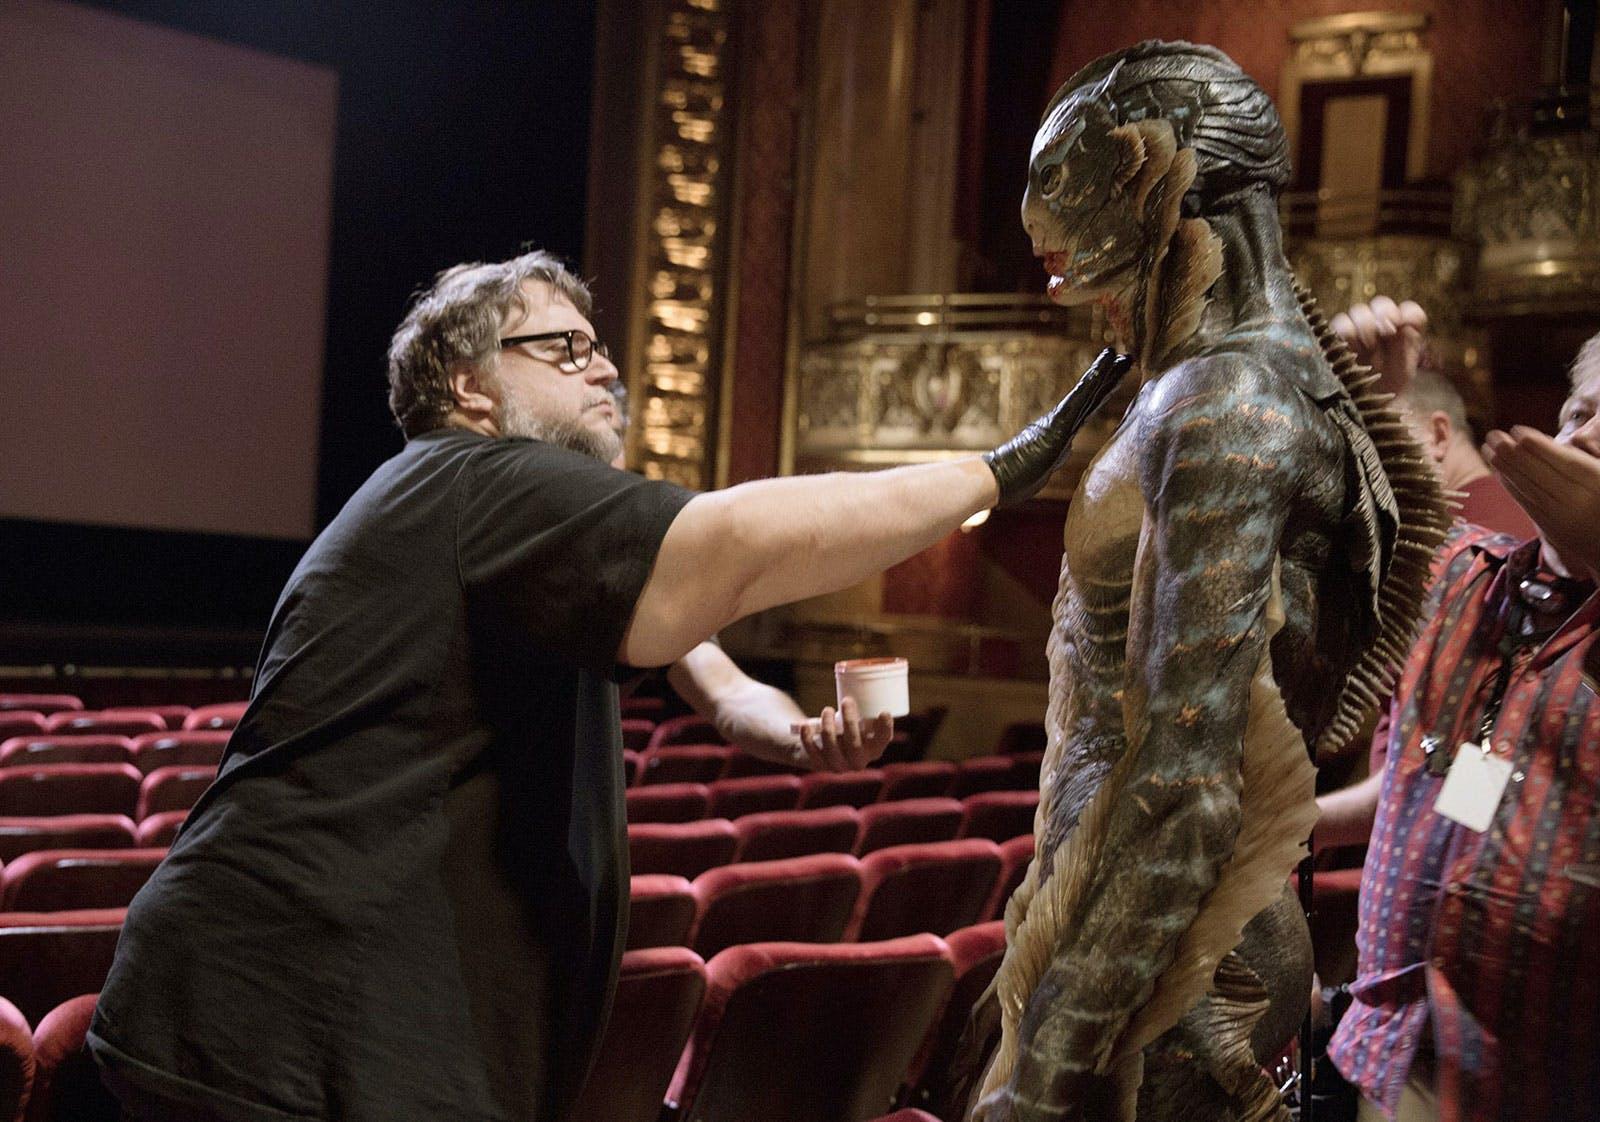 Directors' Trademarks: Guillermo del Toro